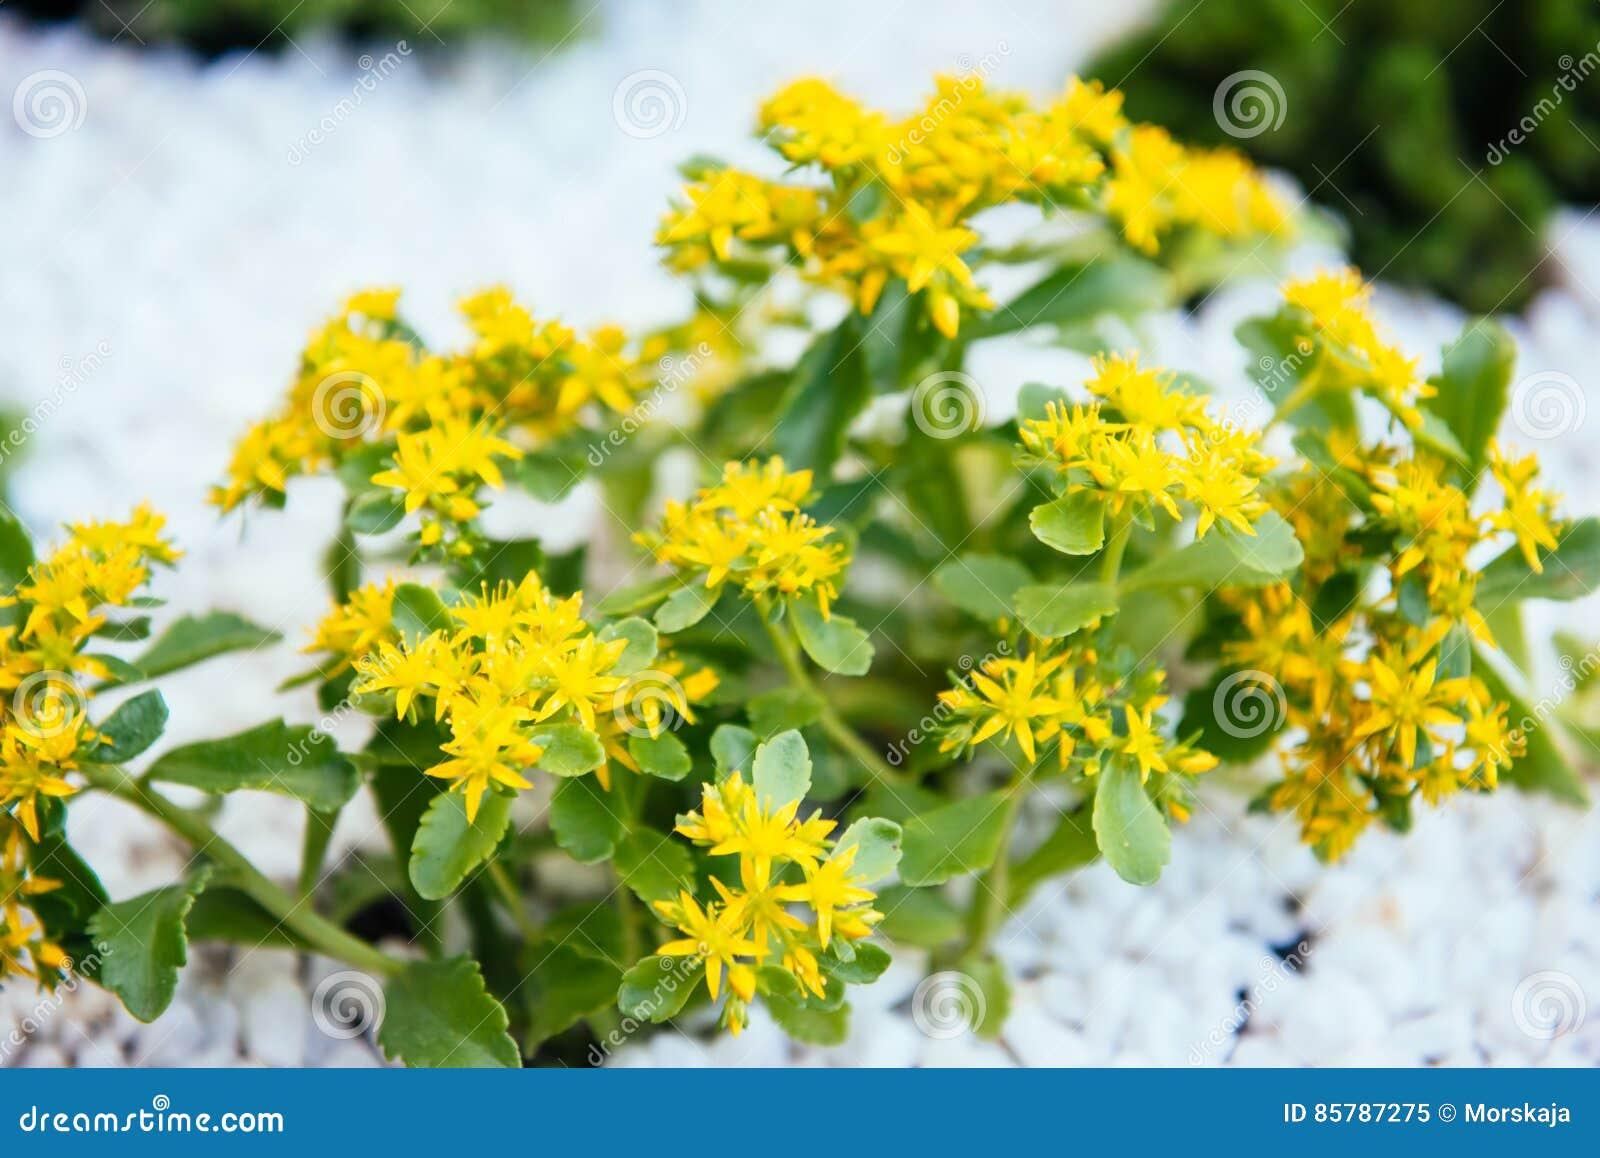 Yellow flowers sedum plants stock image image of decorative yellow flowers sedum plants mightylinksfo